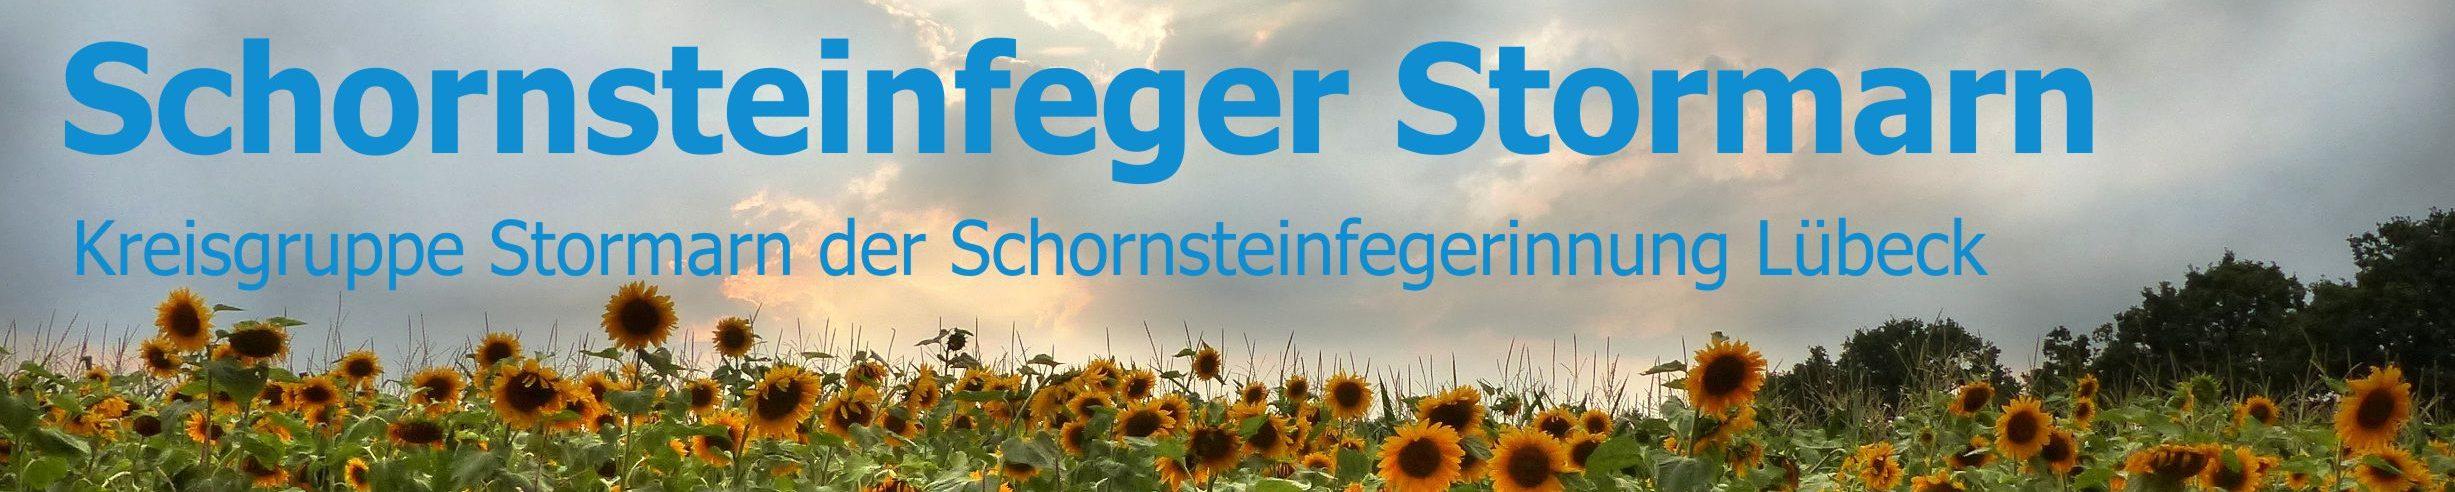 Schornsteinfeger Stormarn